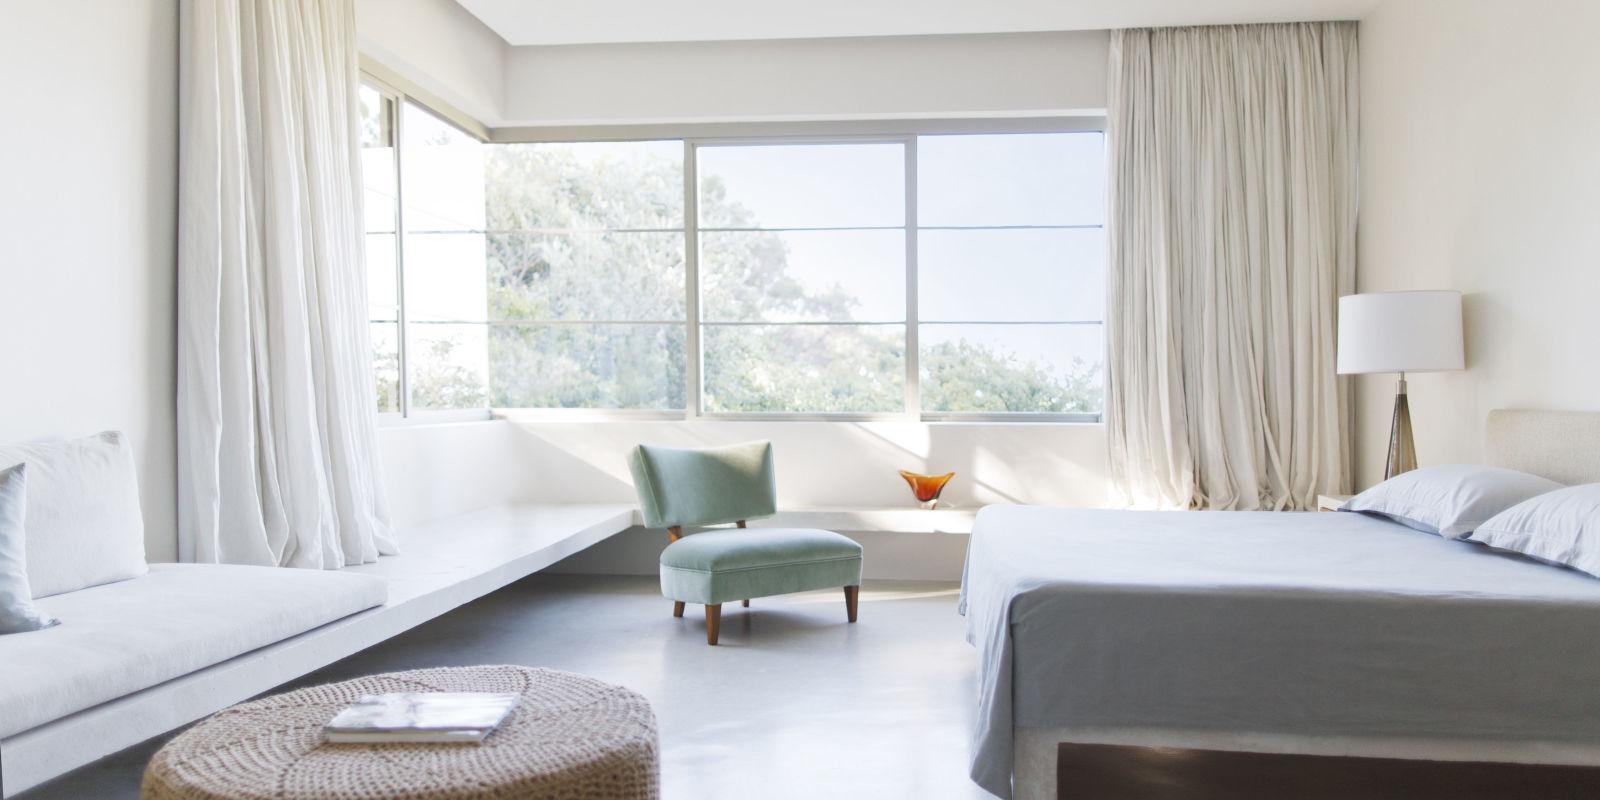 Bedroom Designs Ideas bedroom design ideas 73 inspiration home on bedroom design ideas Bedroom Design Ideas